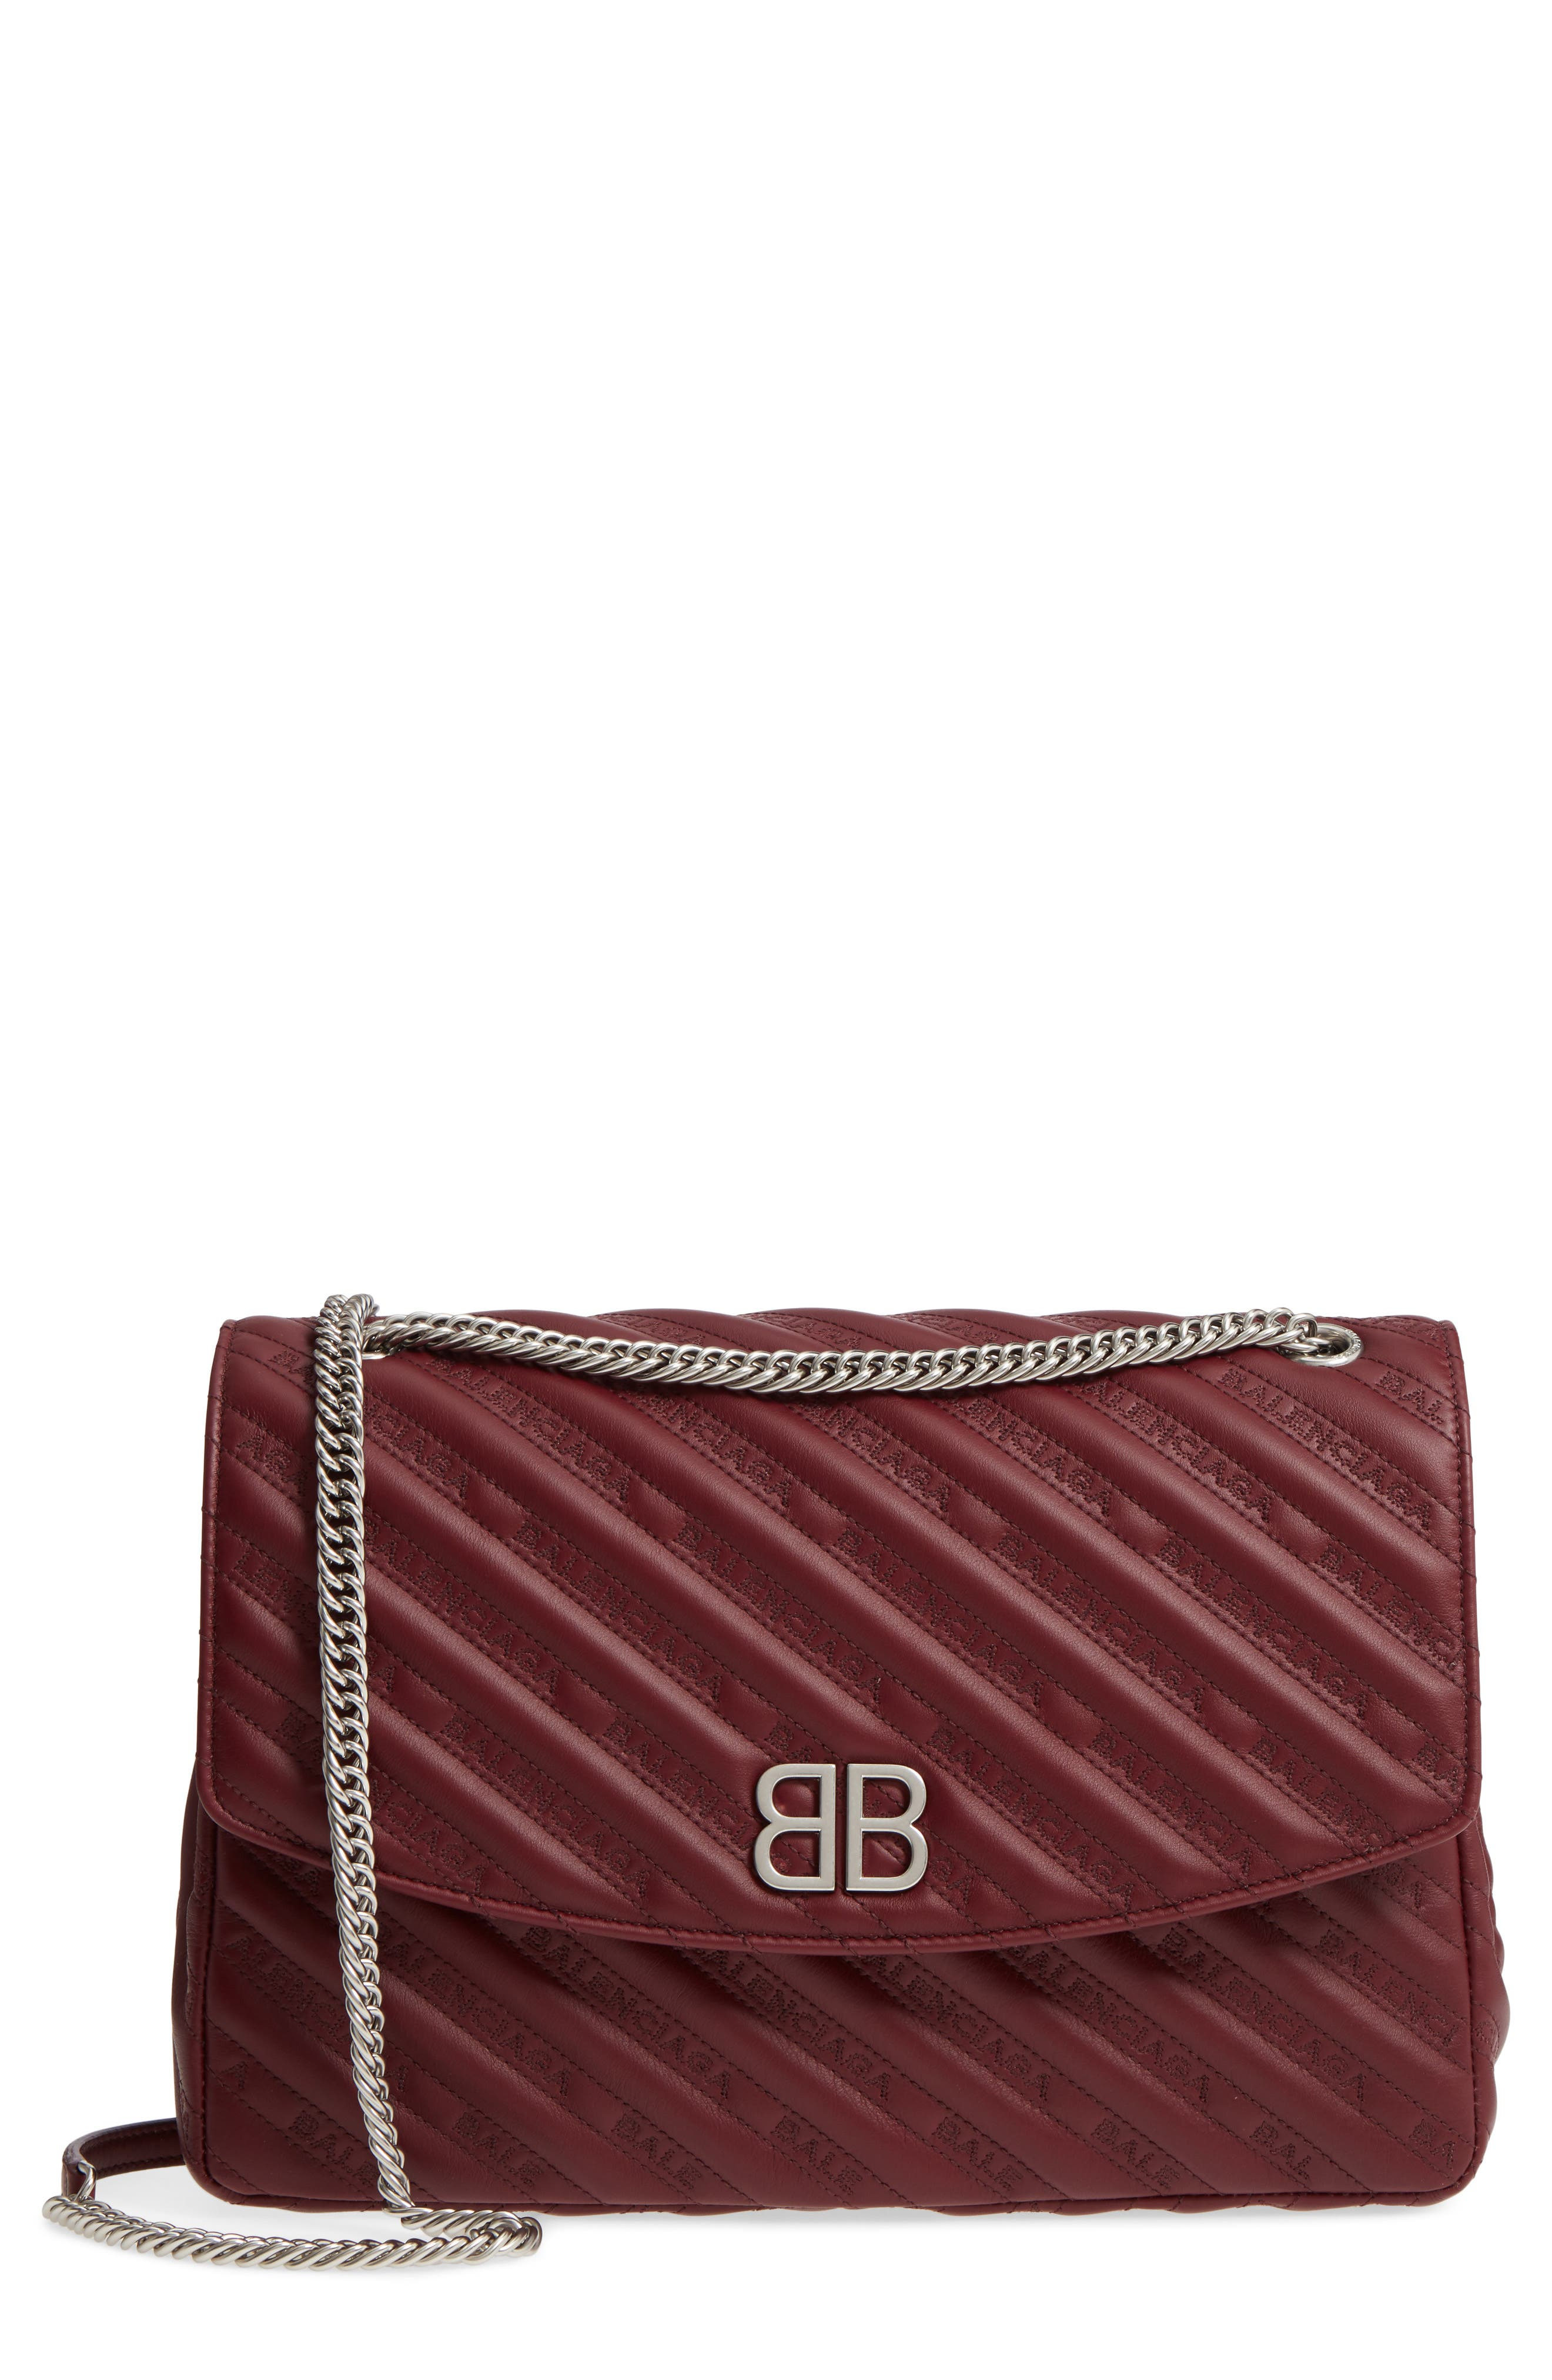 Main Image - Balenciaga Matelassé Calfskin Leather Shoulder Bag